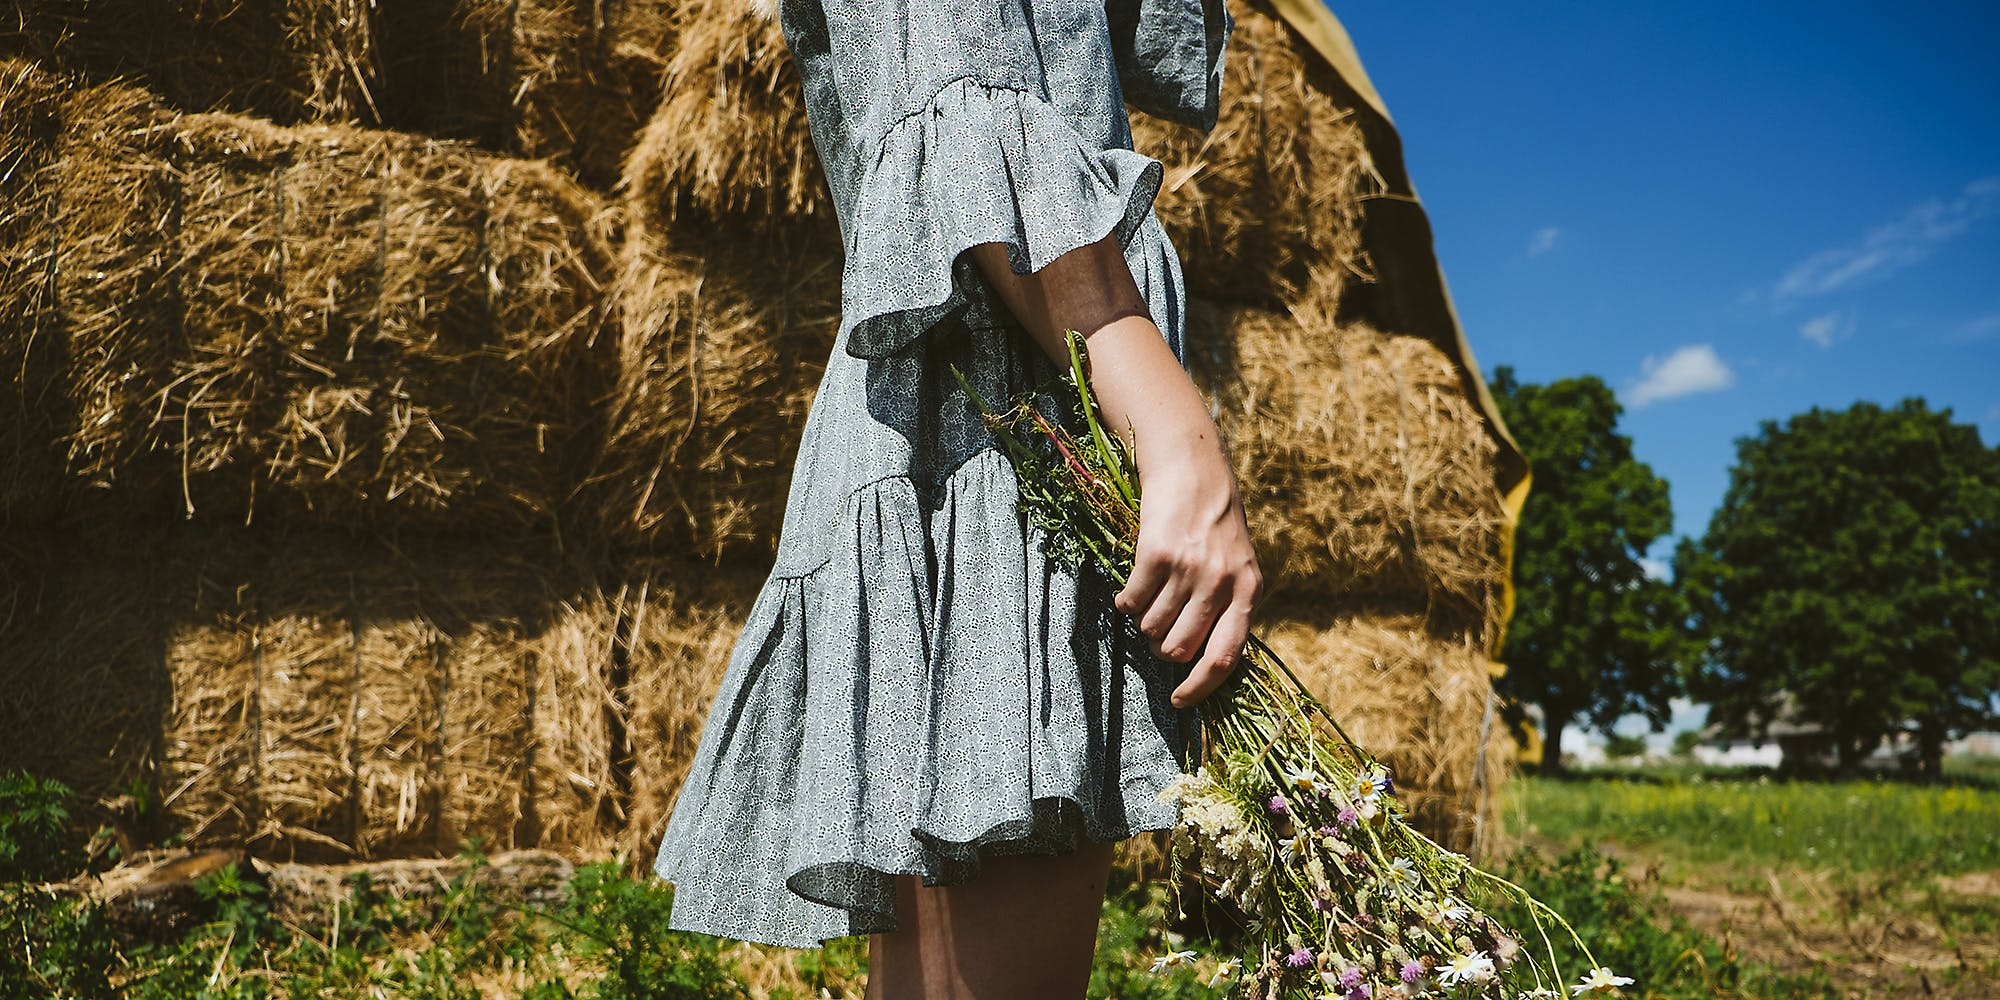 A girl wearing a dress on a farm.